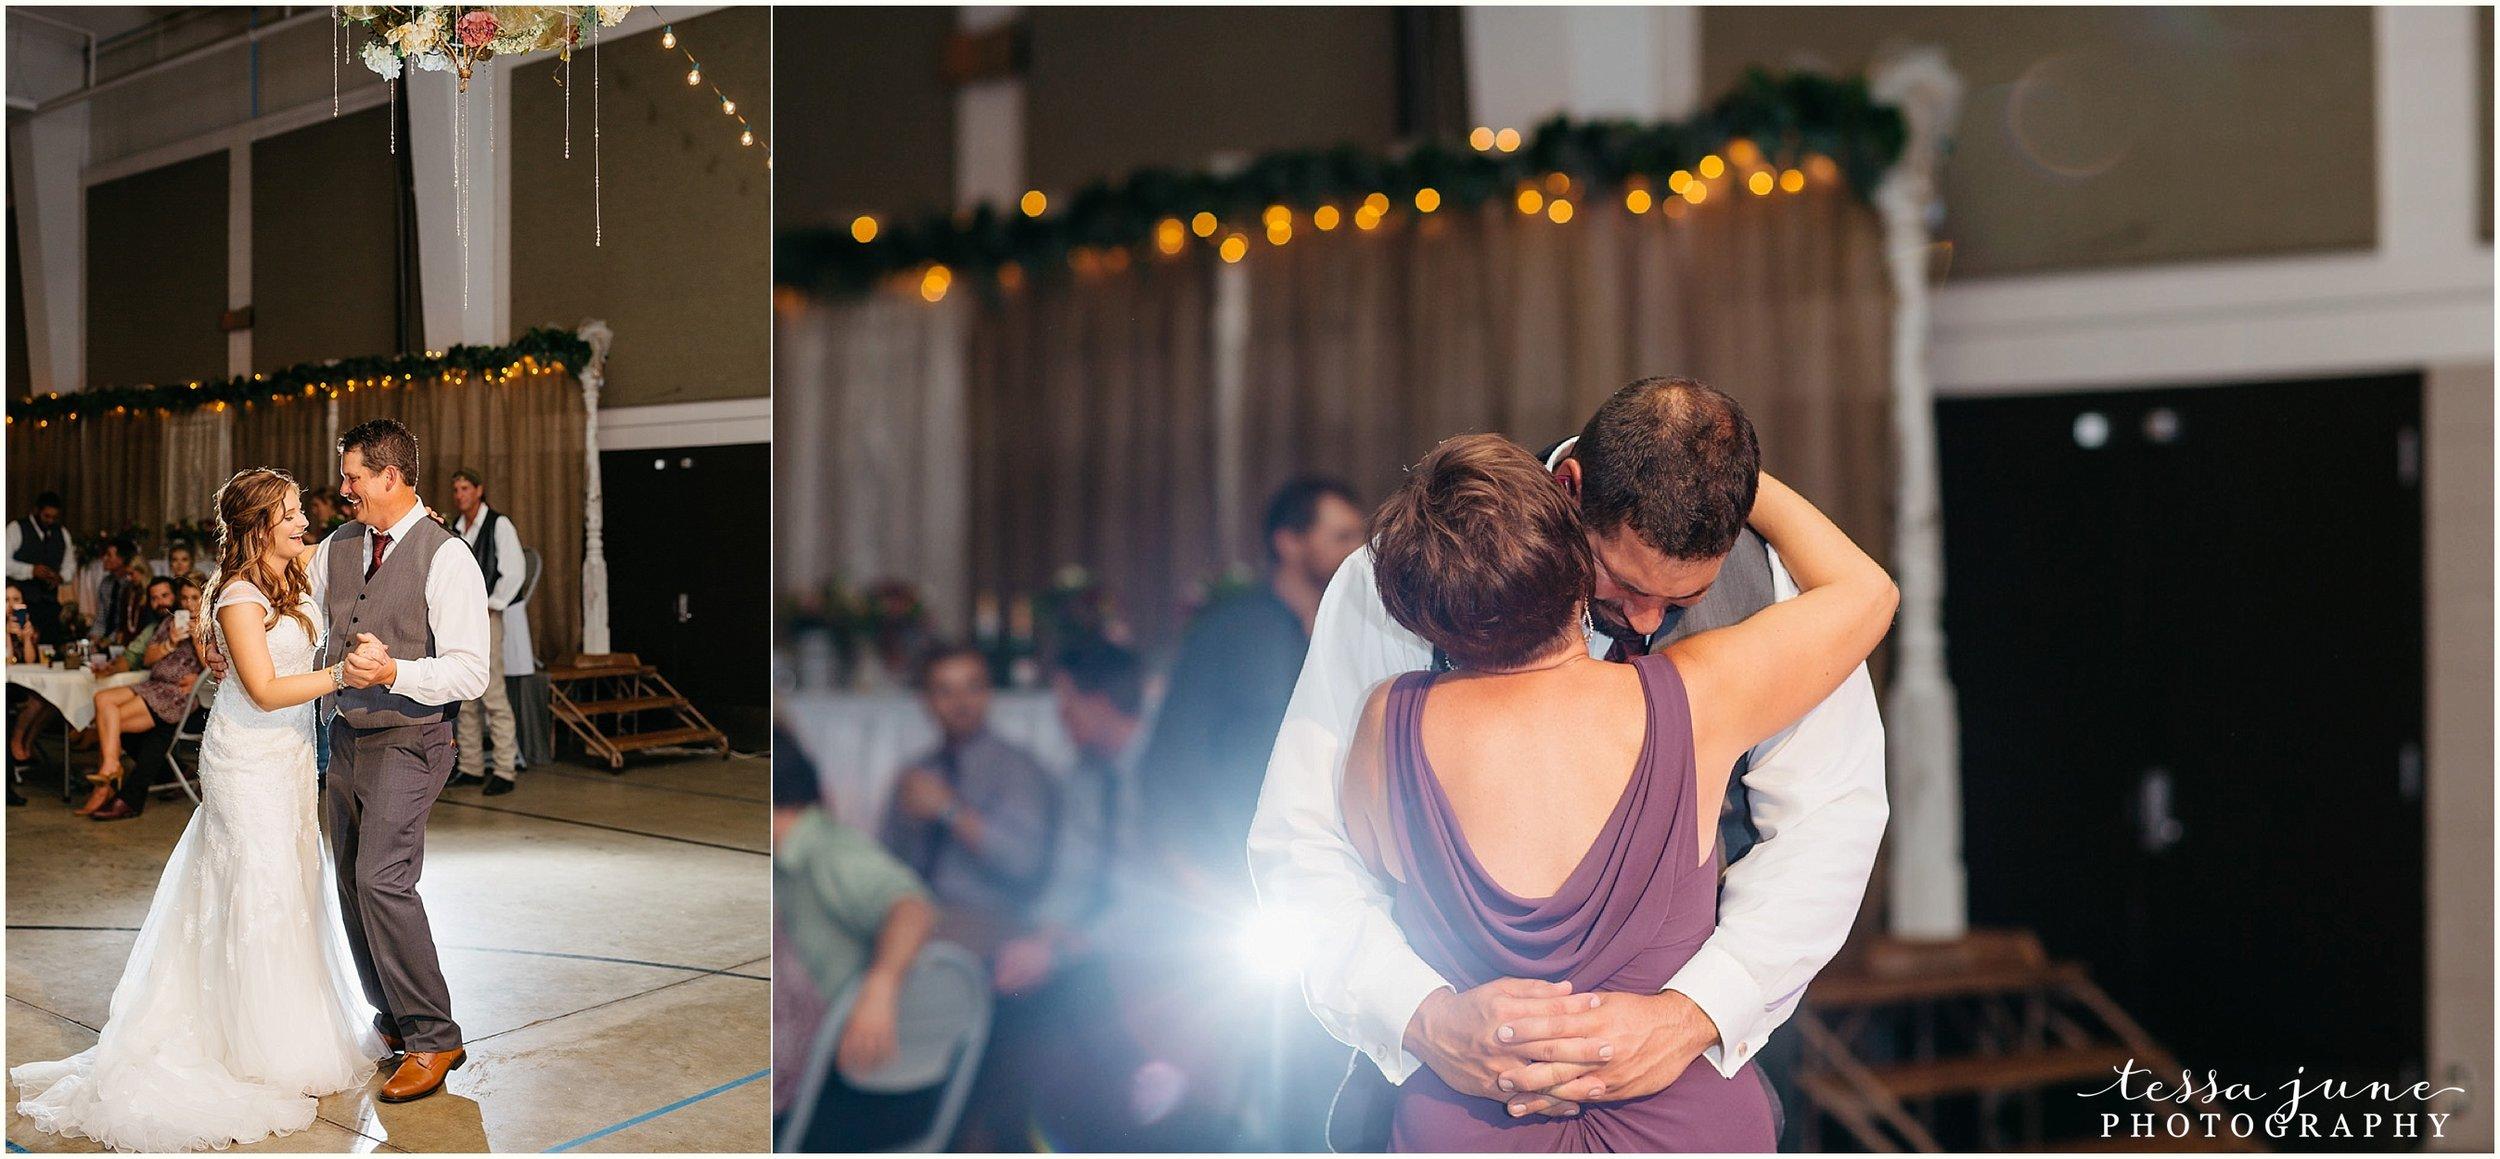 bohemian-minnesota-wedding-mismatched-bridesmaid-dresses-waterfall-st-cloud-tessa-june-photography-193.jpg